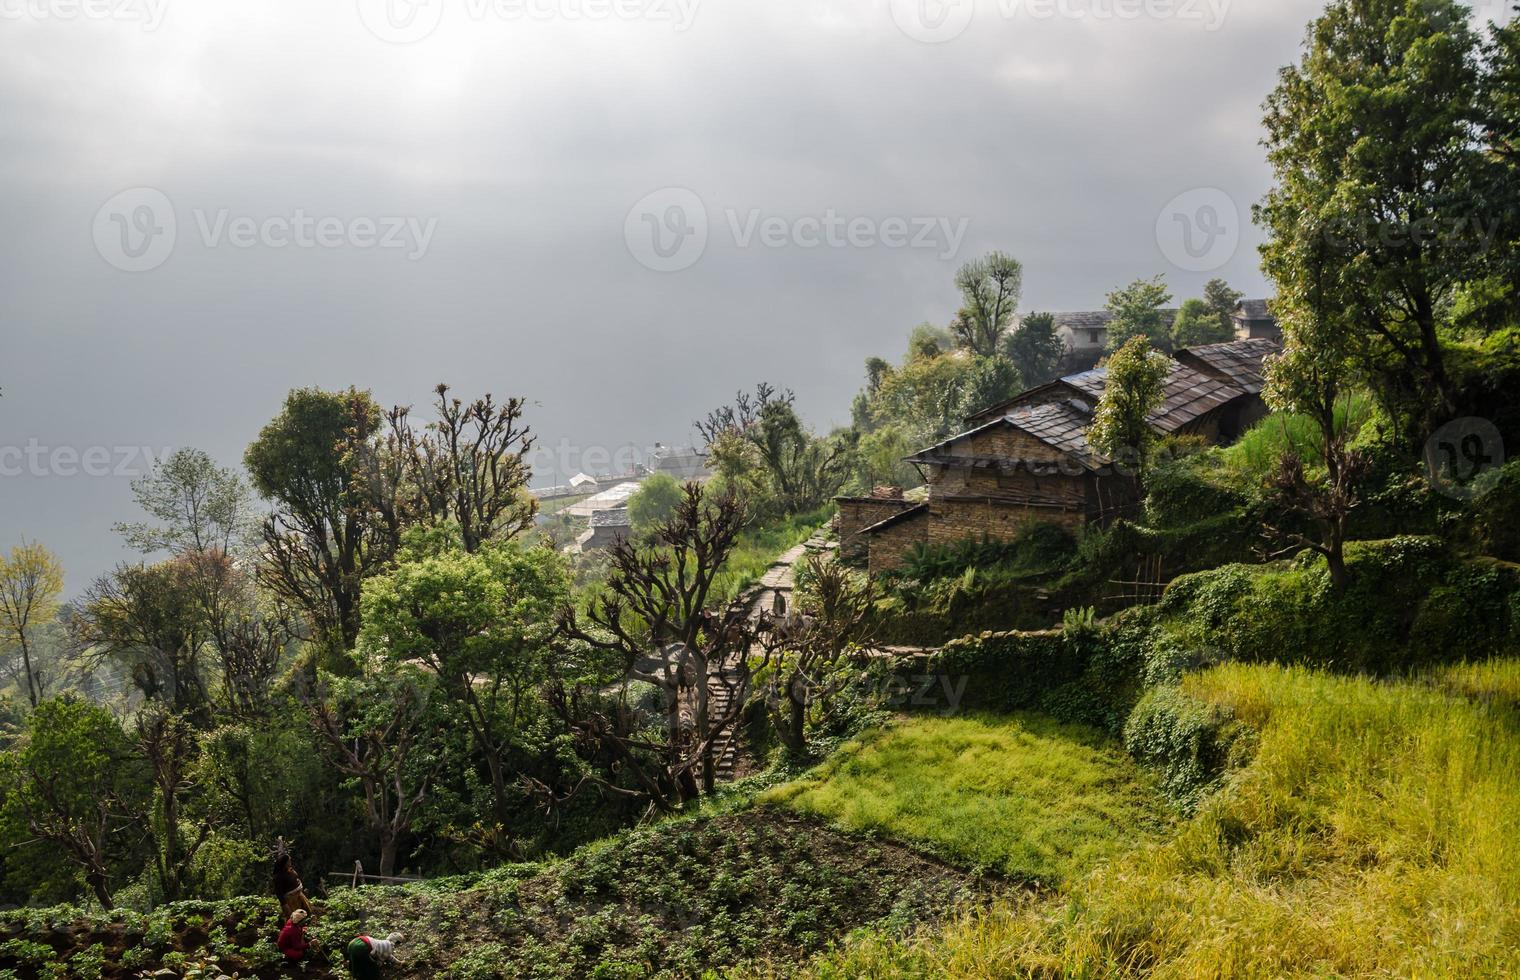 ghandruk bergdorp in pokhara, nepal foto